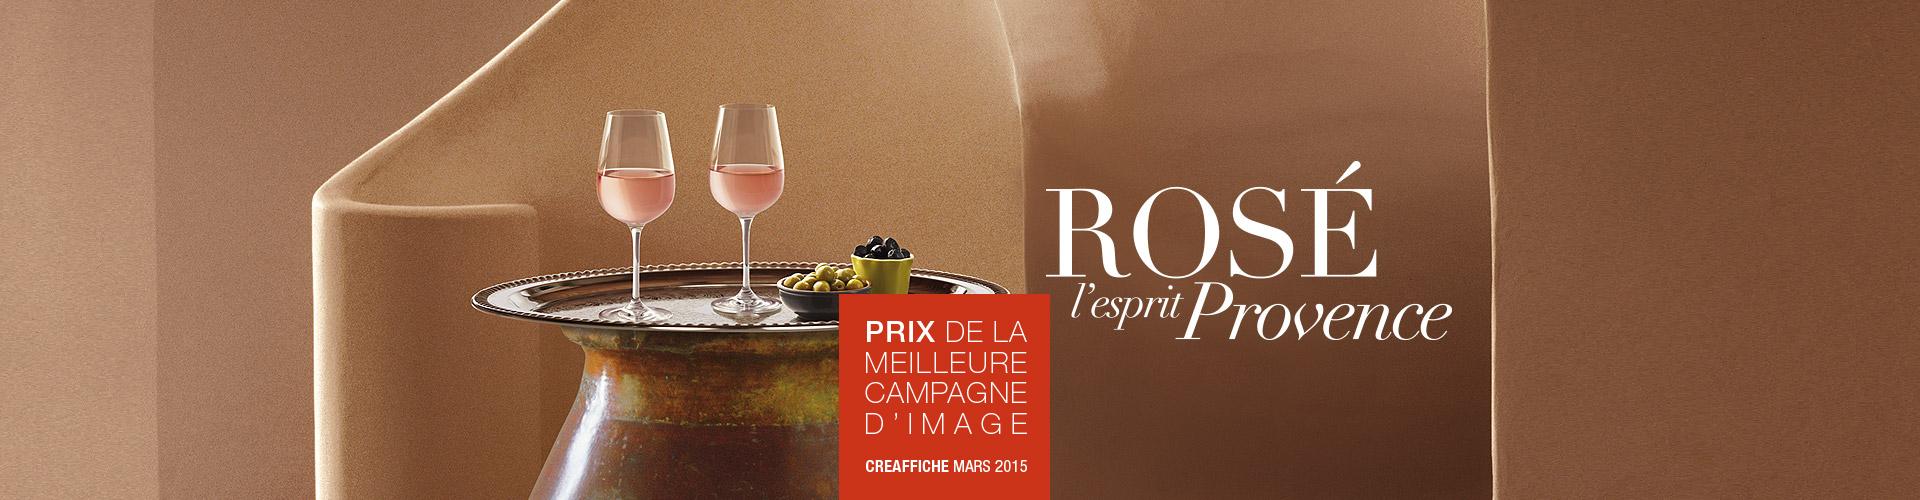 CIVP, Rosé, l'esprit Provence